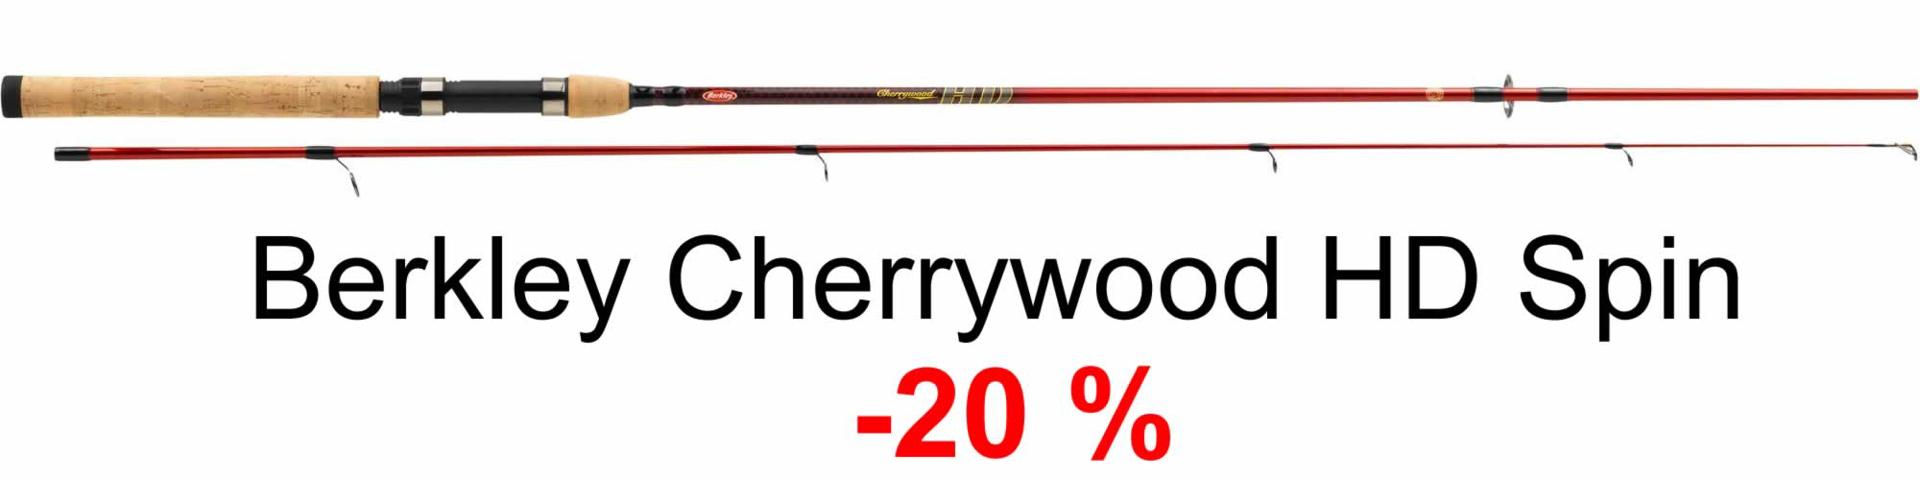 Berkley Cherrywood HD Spin -20%